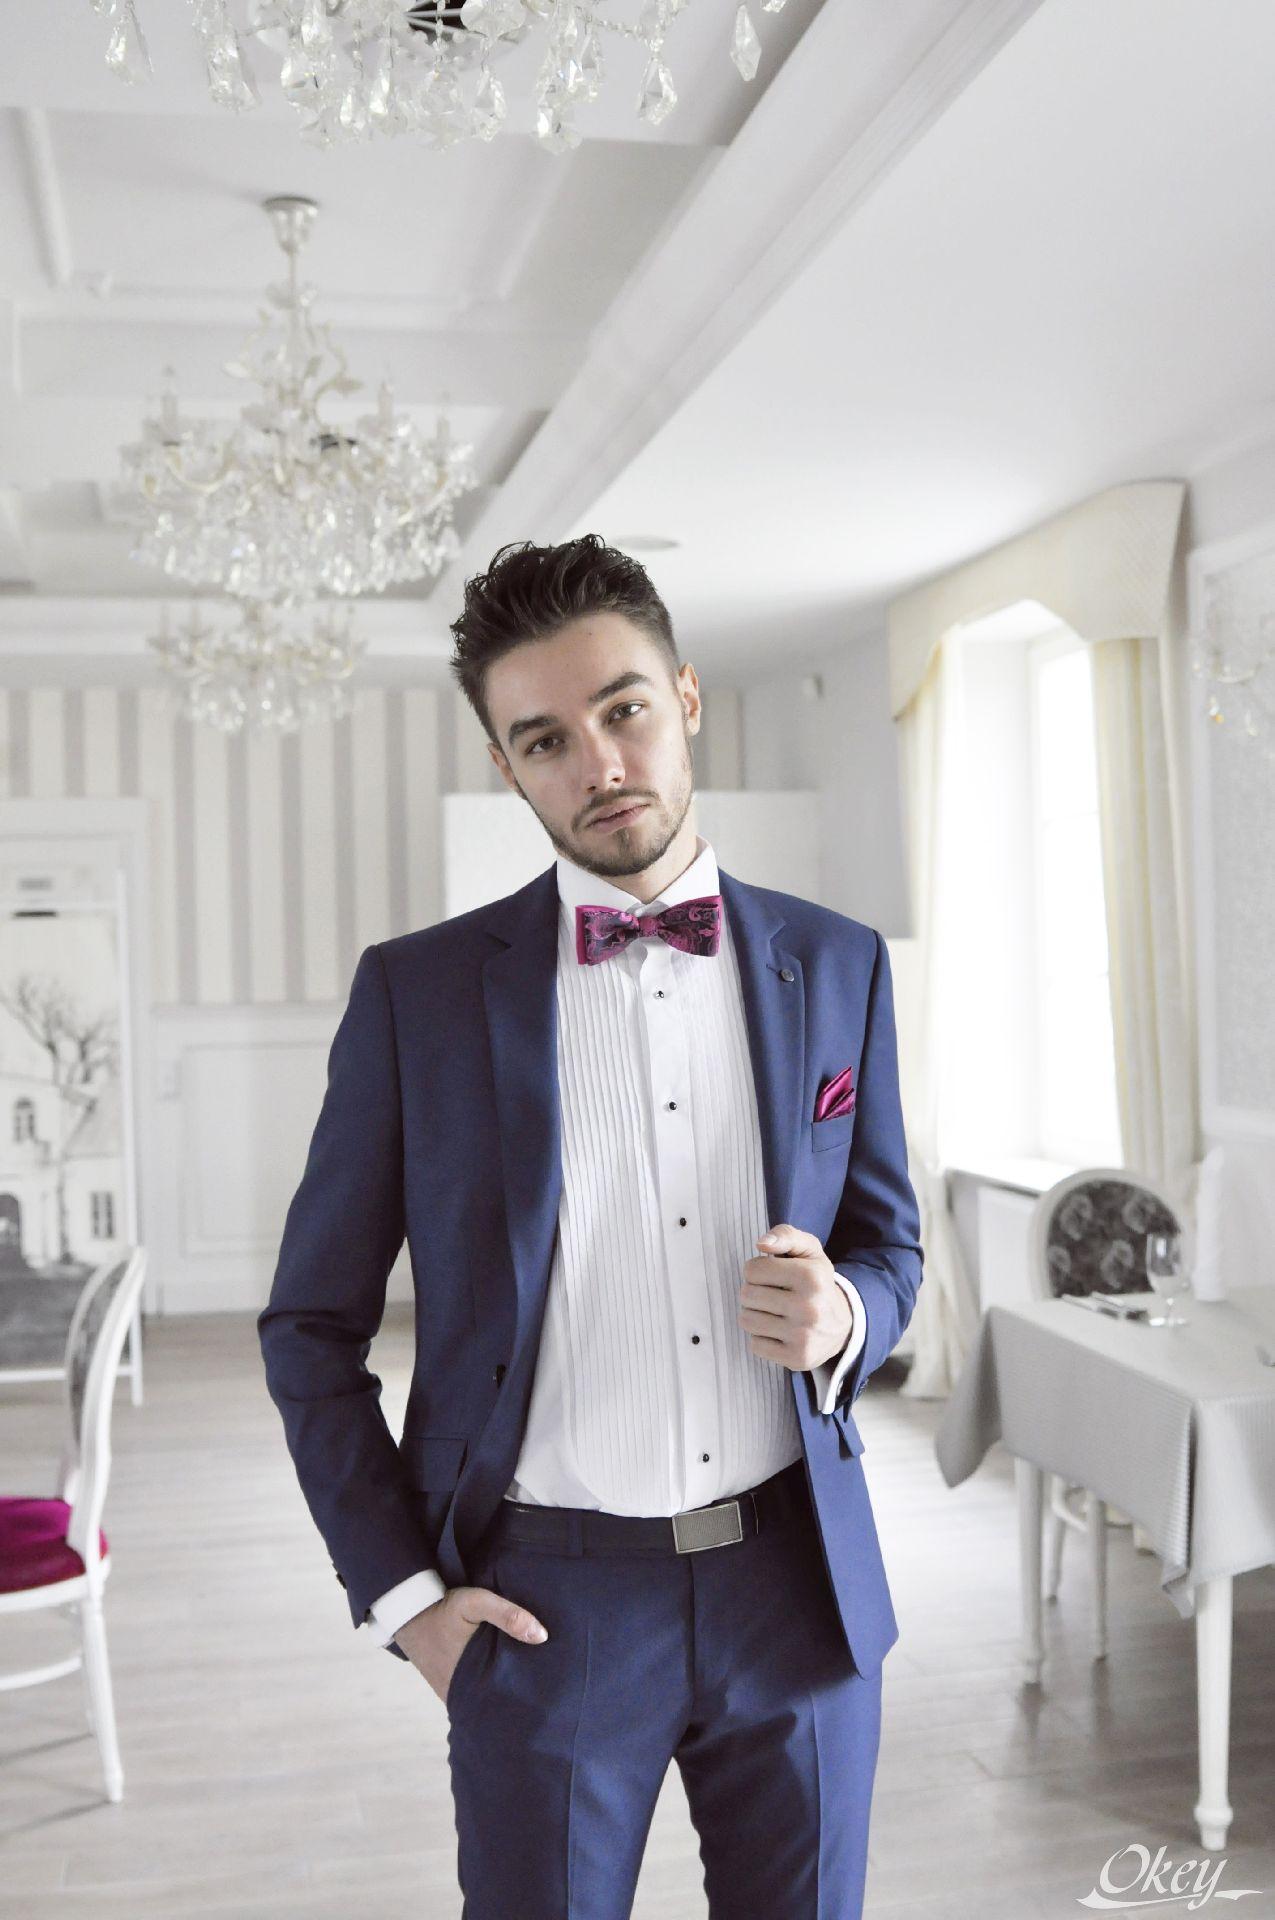 0e3e9ad6dcf1f Archiwa: Garnitury na ślub radom | Salon Mody Męskiej Okey